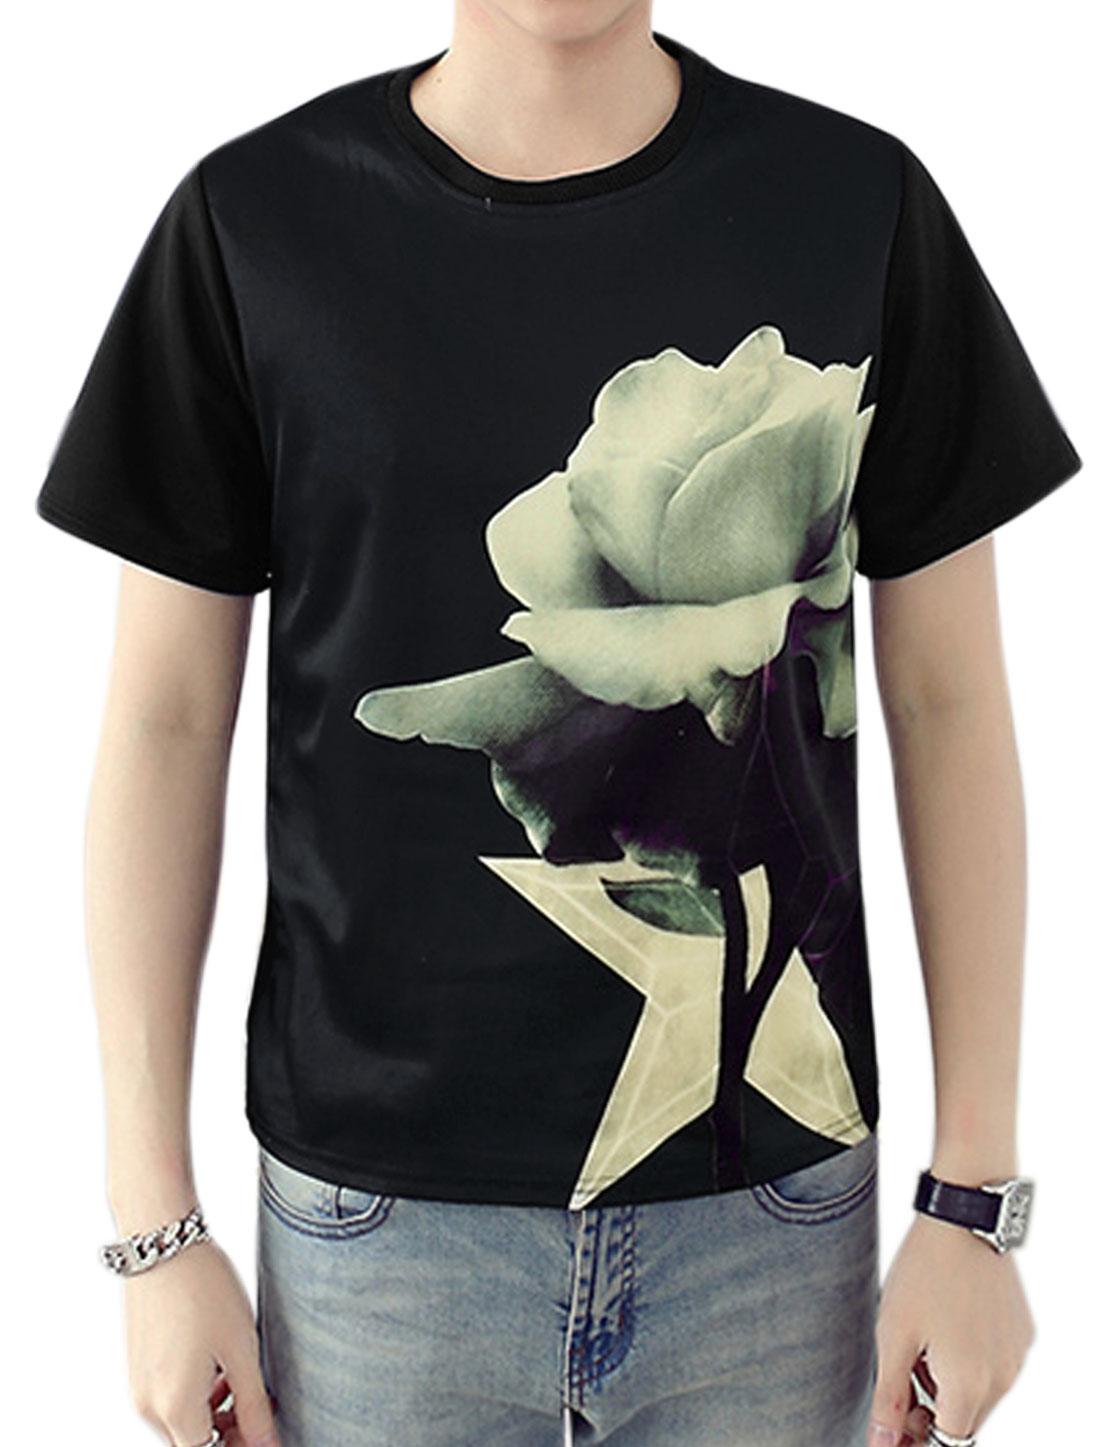 Men Crew Neck Short Sleeves Floral Print Tee Shirt Black S